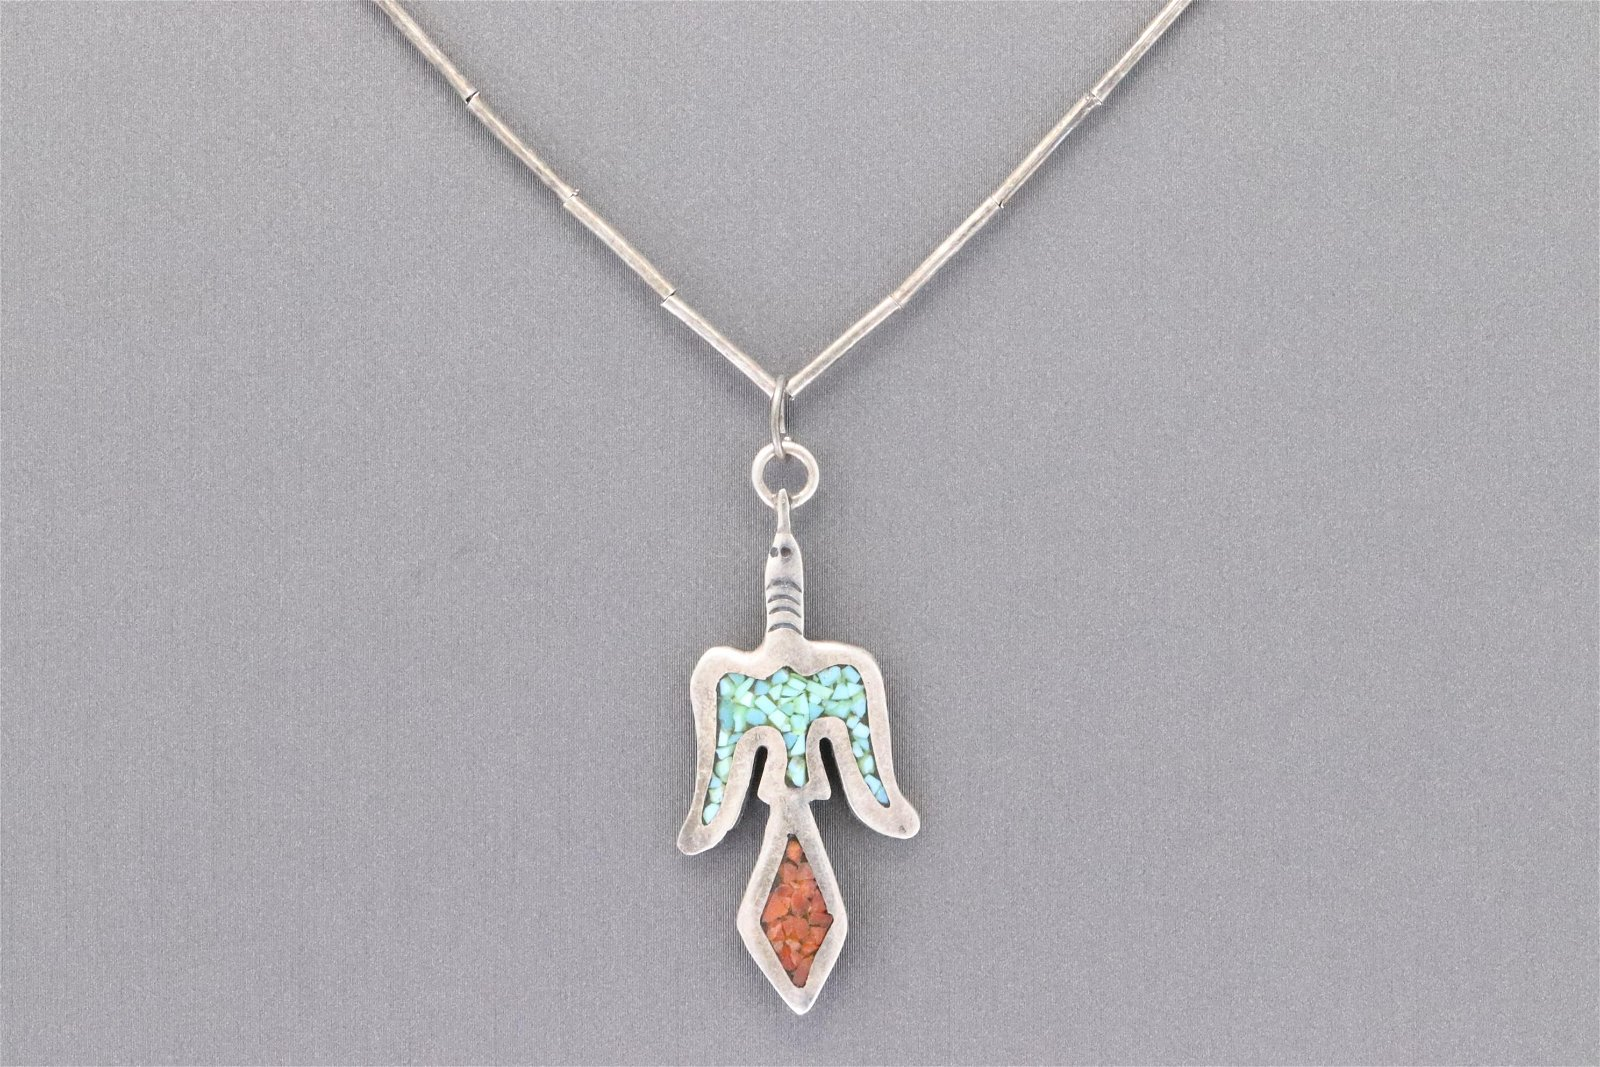 Peyote bird sterling silver Navajo pendant with